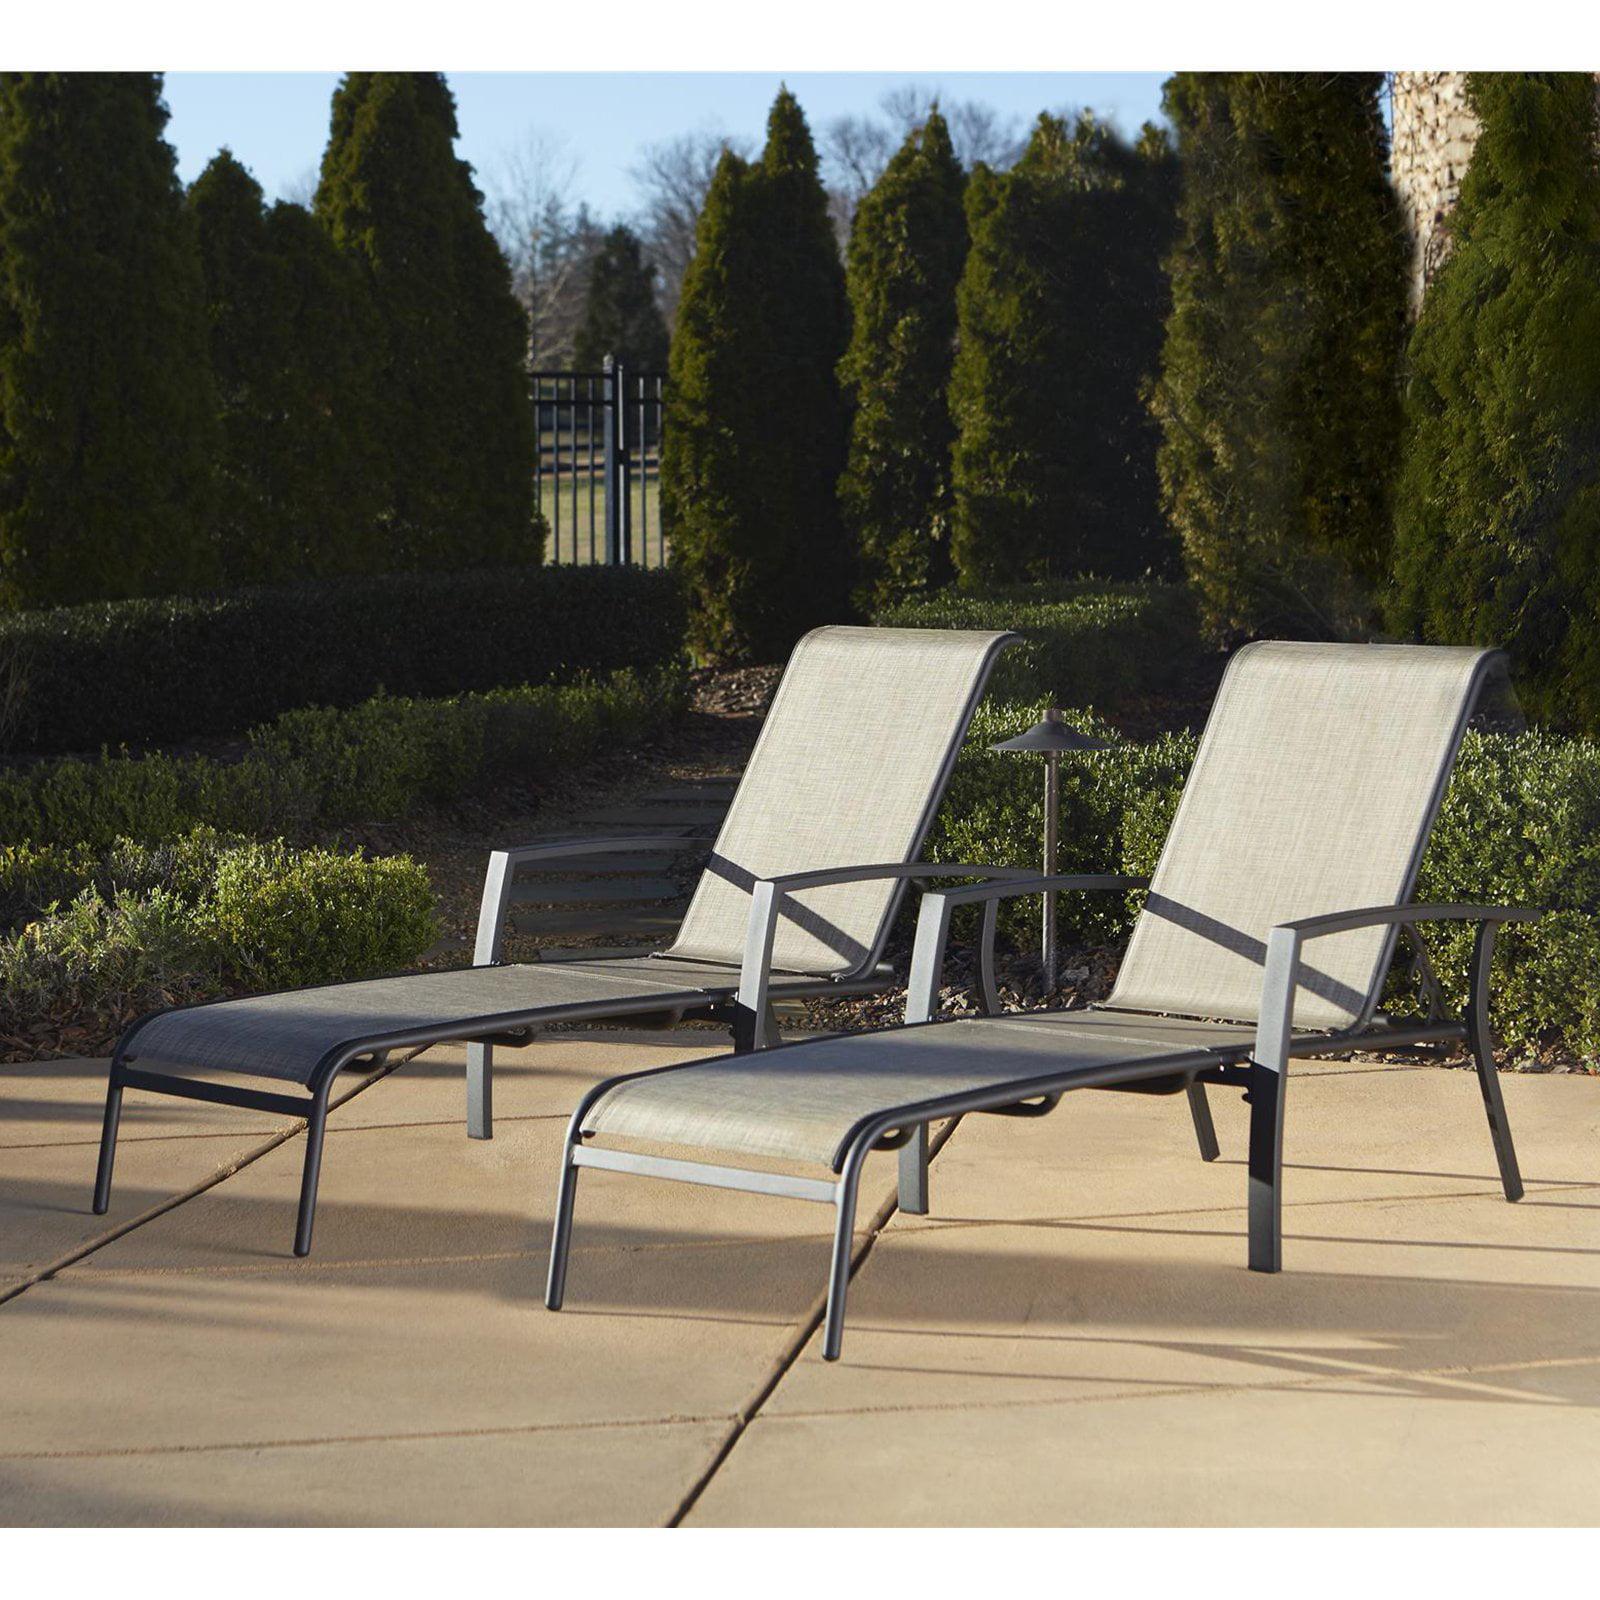 Cosco Serene Ridge Outdoor Aluminum Chaise Lounge Pack Of